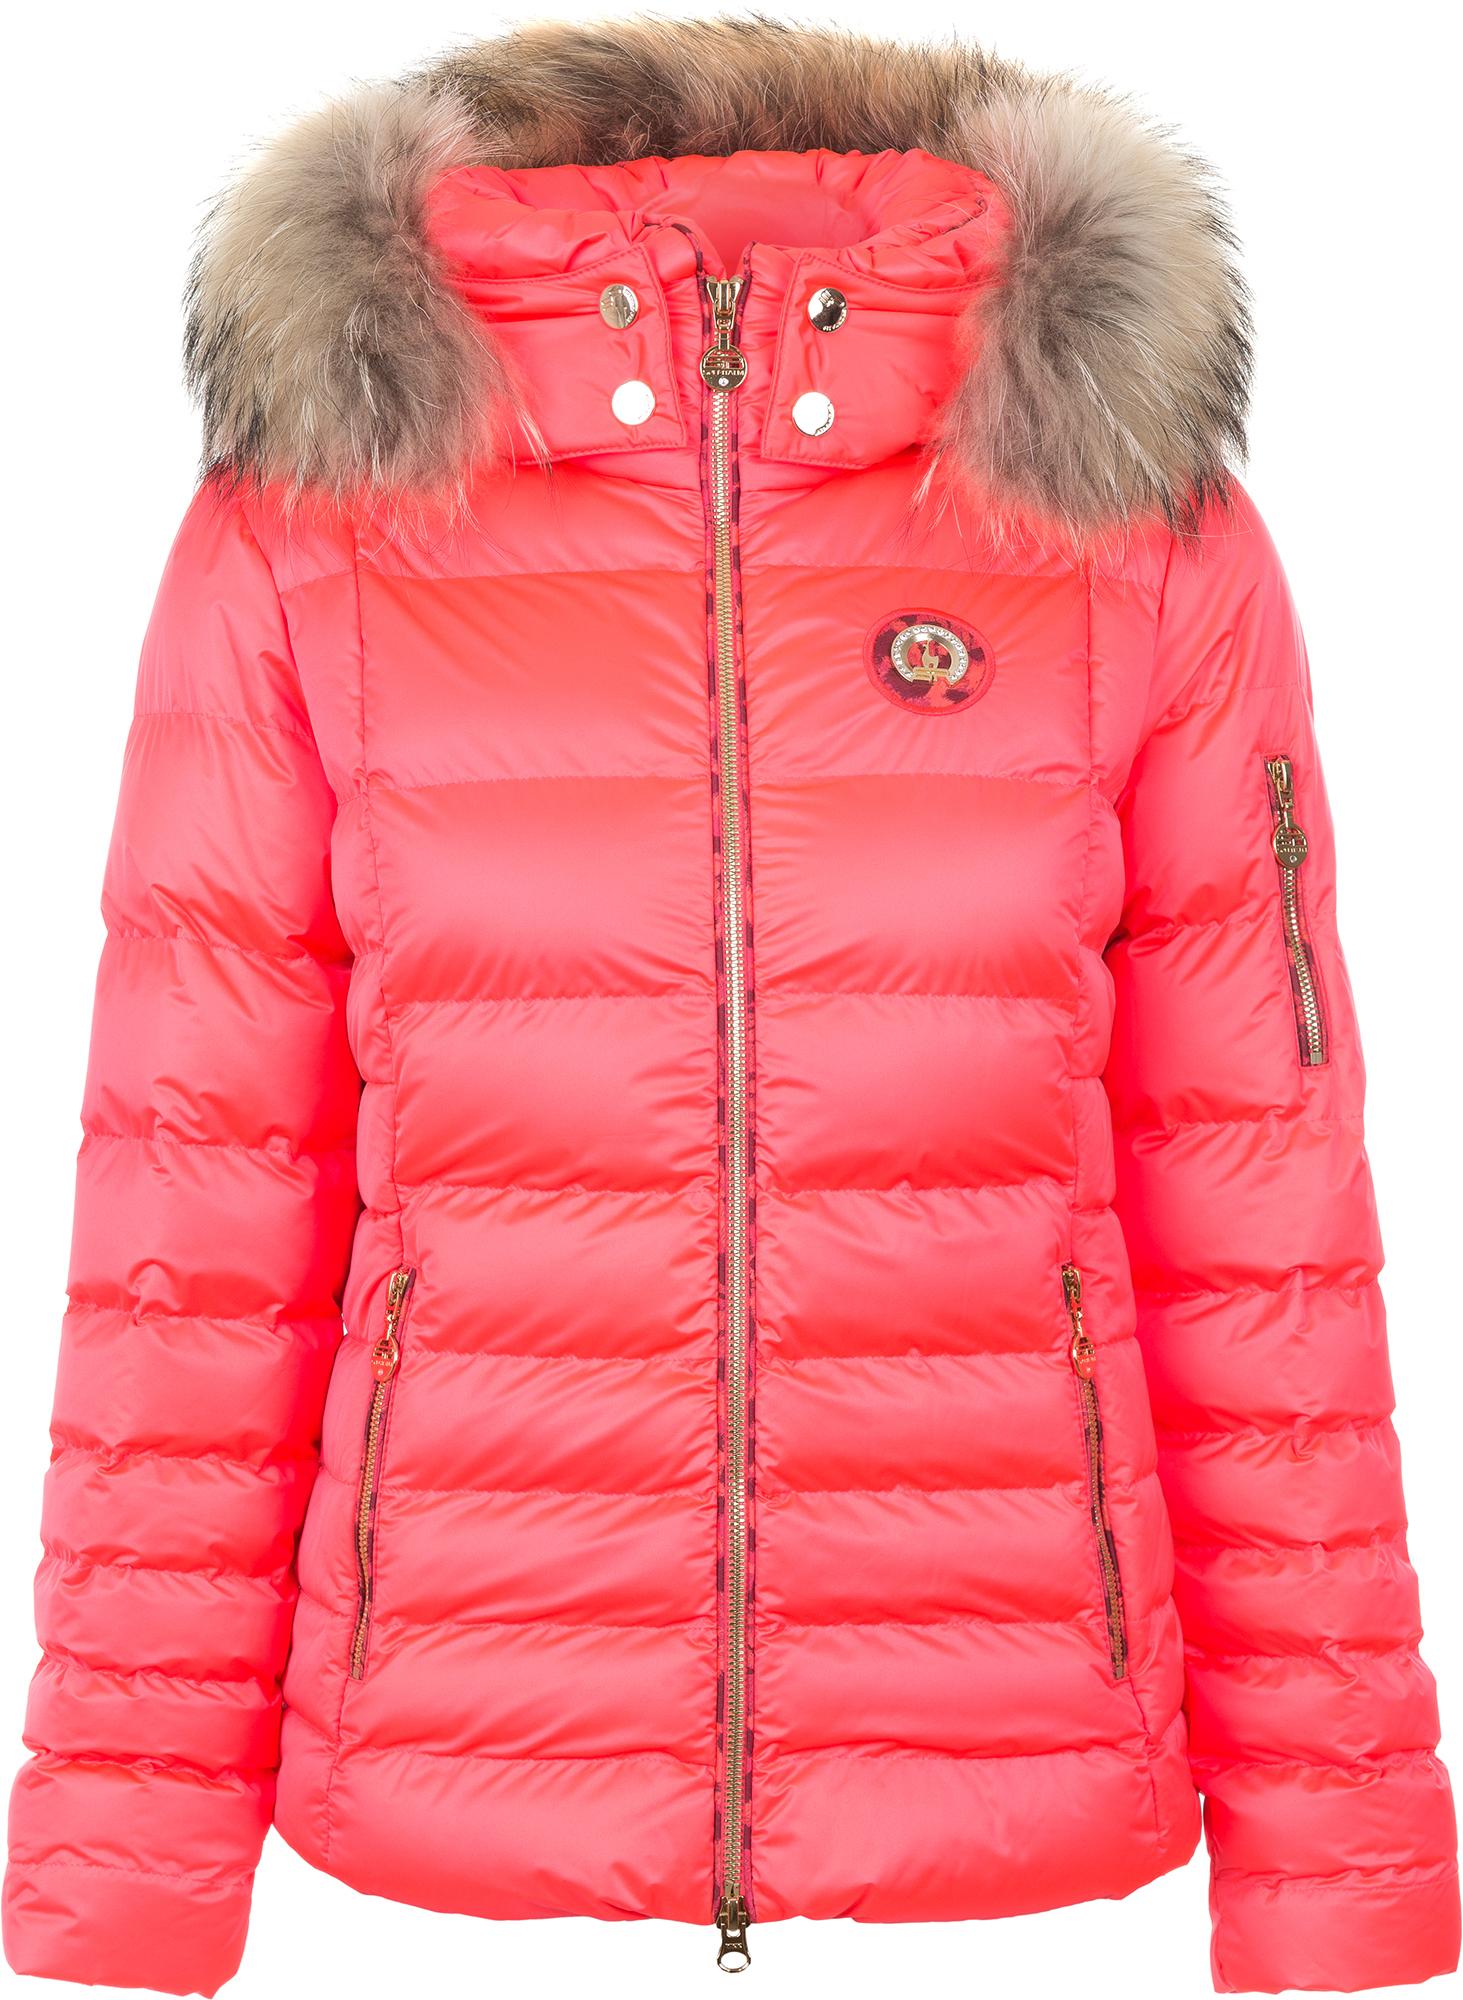 Sportalm Куртка пуховая женская Kyla RR Neon, размер 42